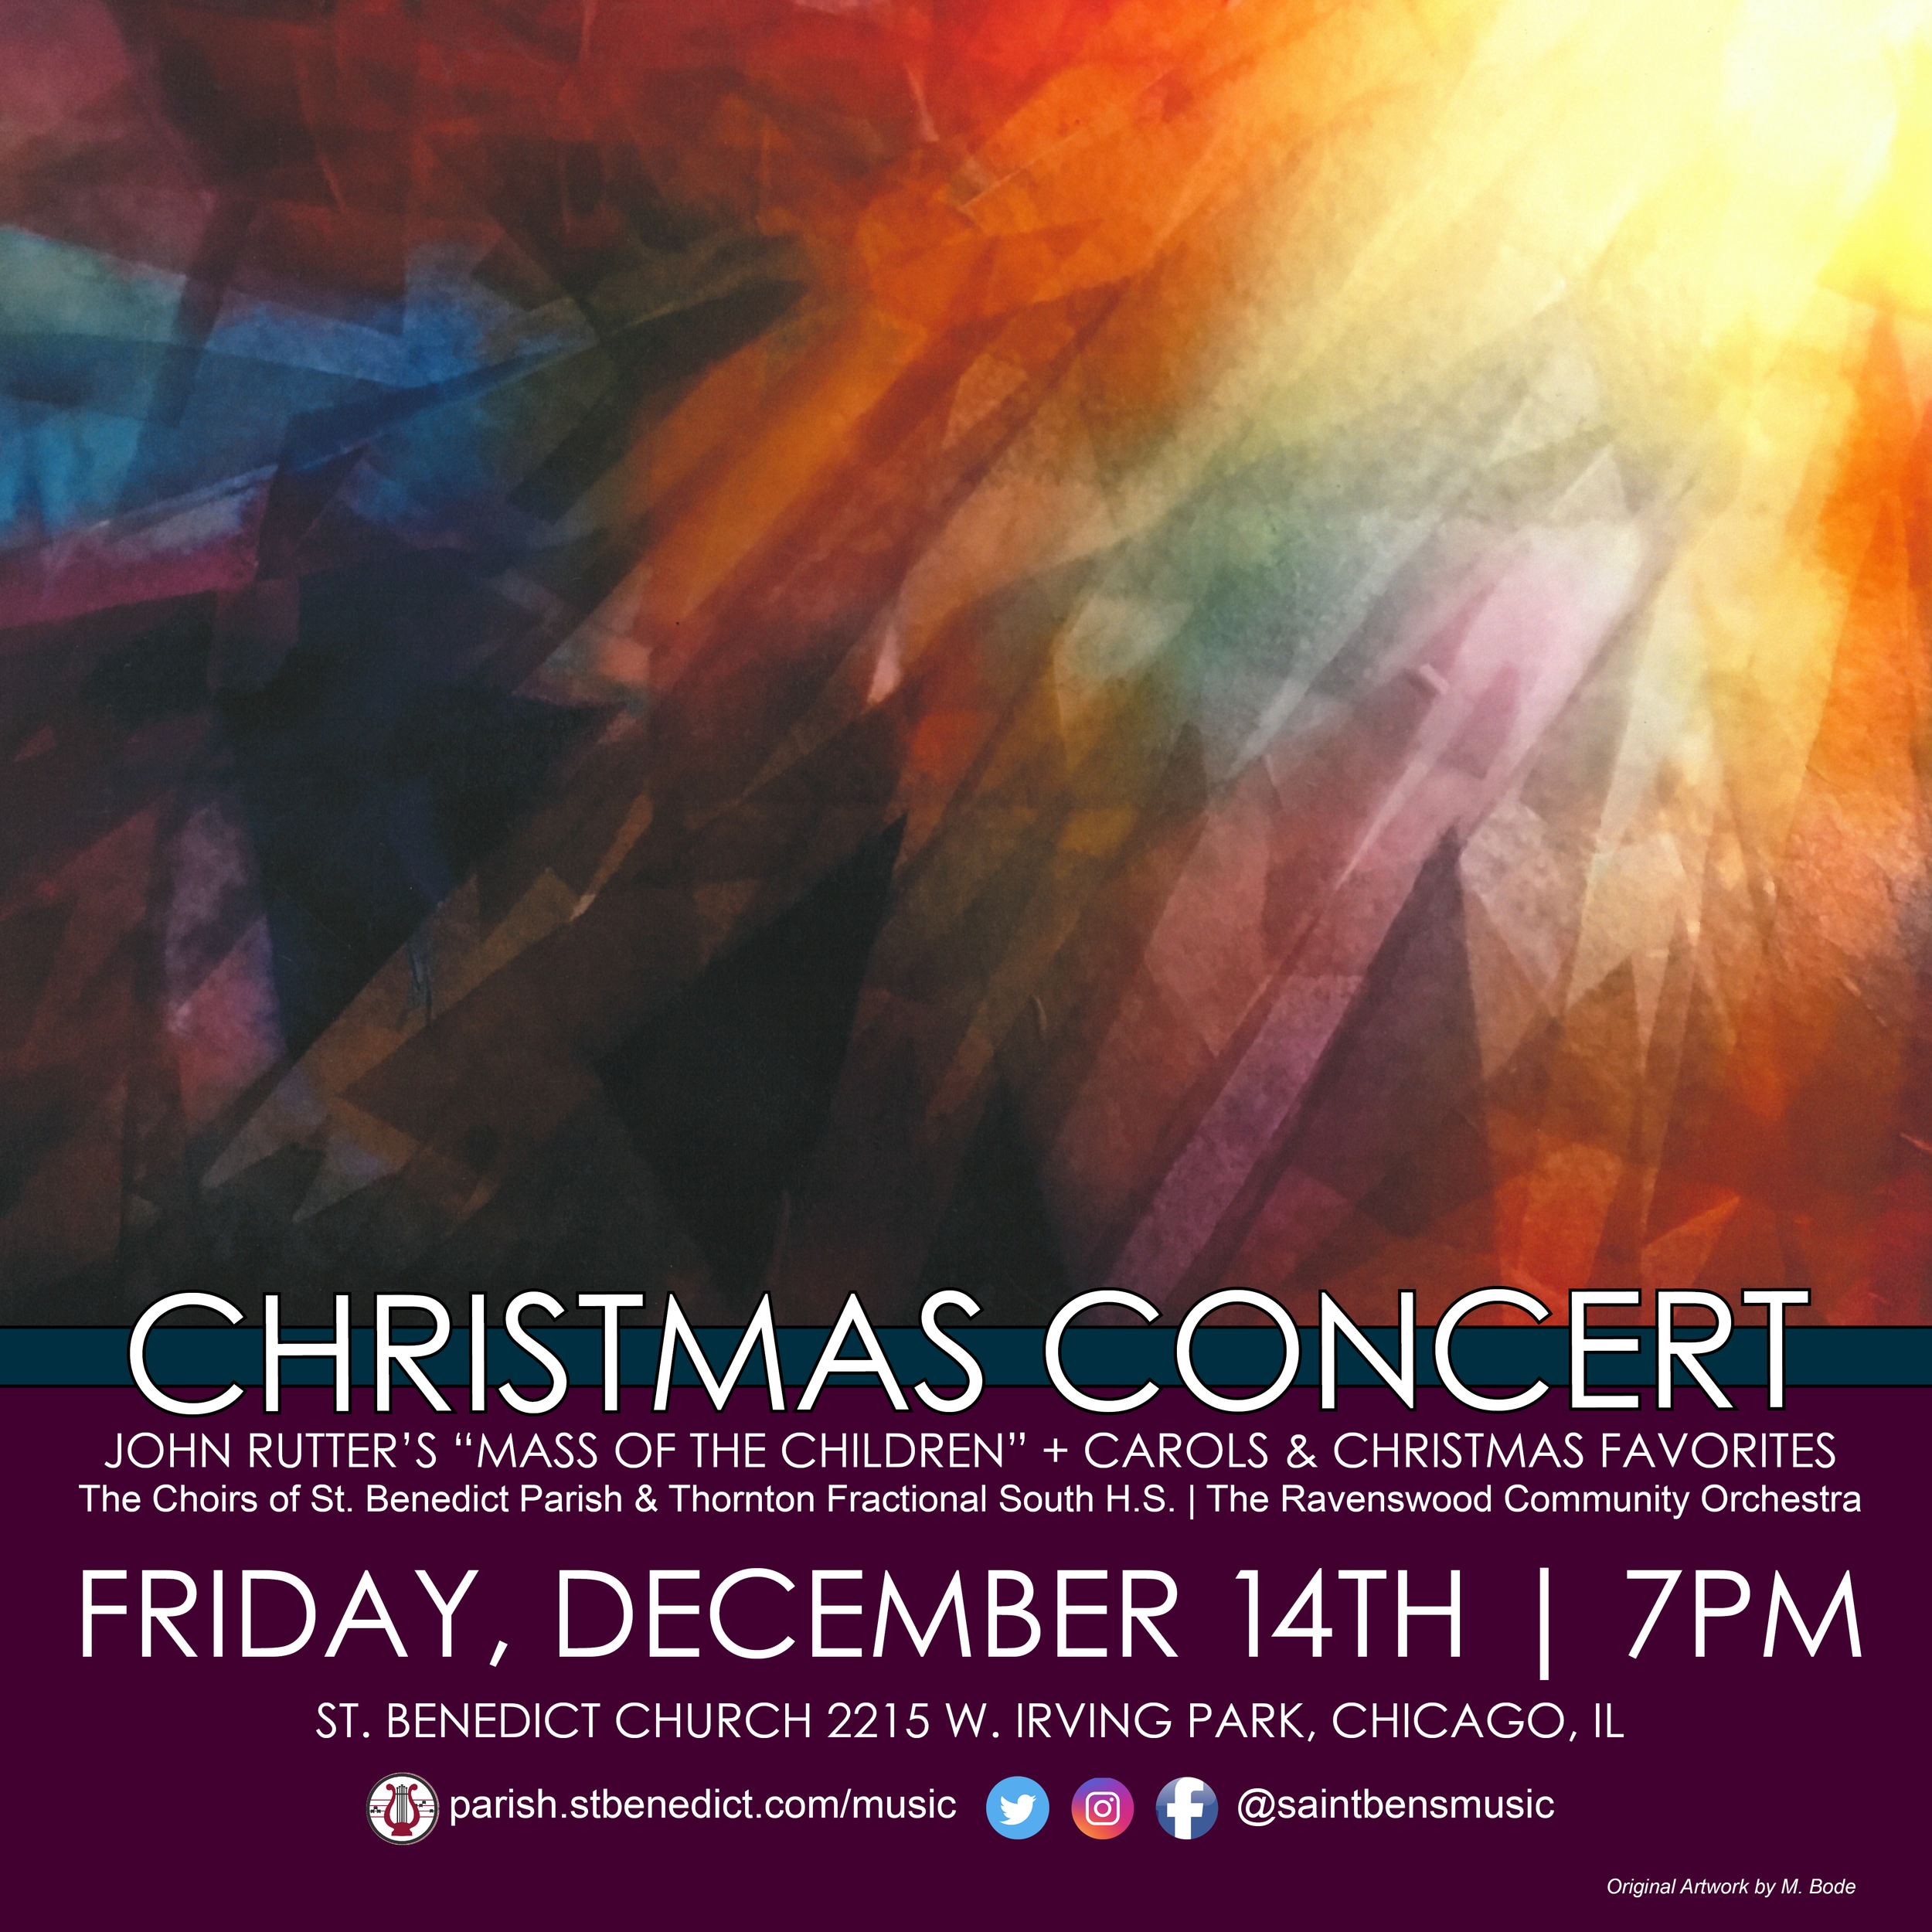 Christmas Concert Poster 2018 FINAL.png